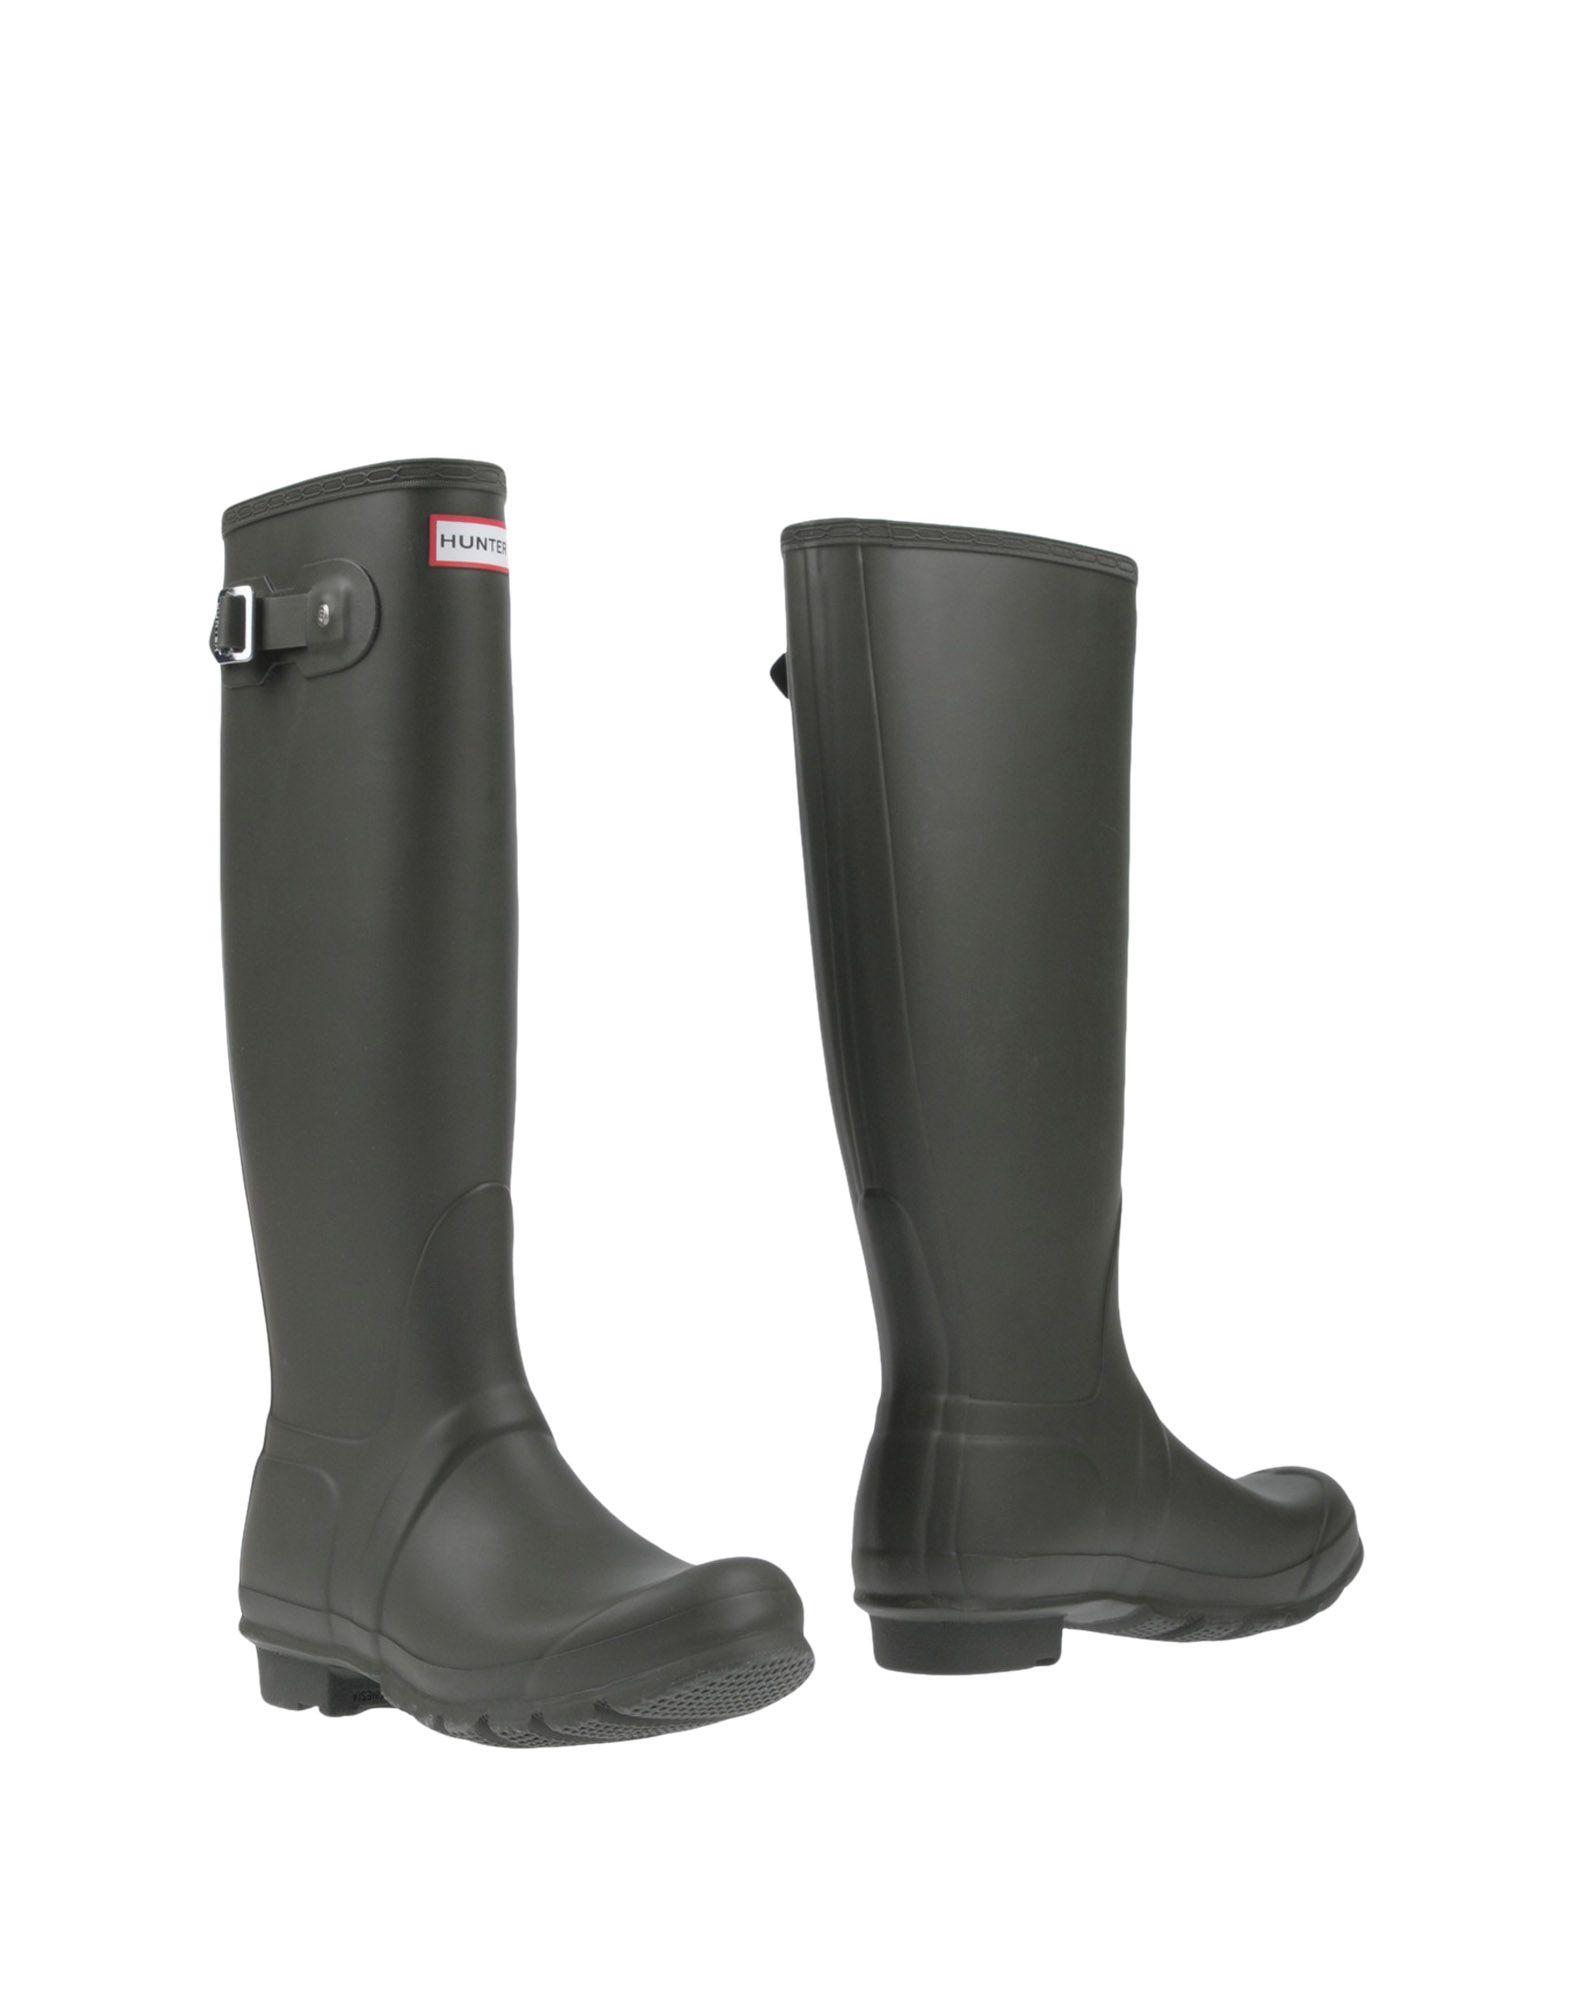 Hunter Stiefel Damen  11447255DE Gute Qualität beliebte beliebte Qualität Schuhe 092bb5